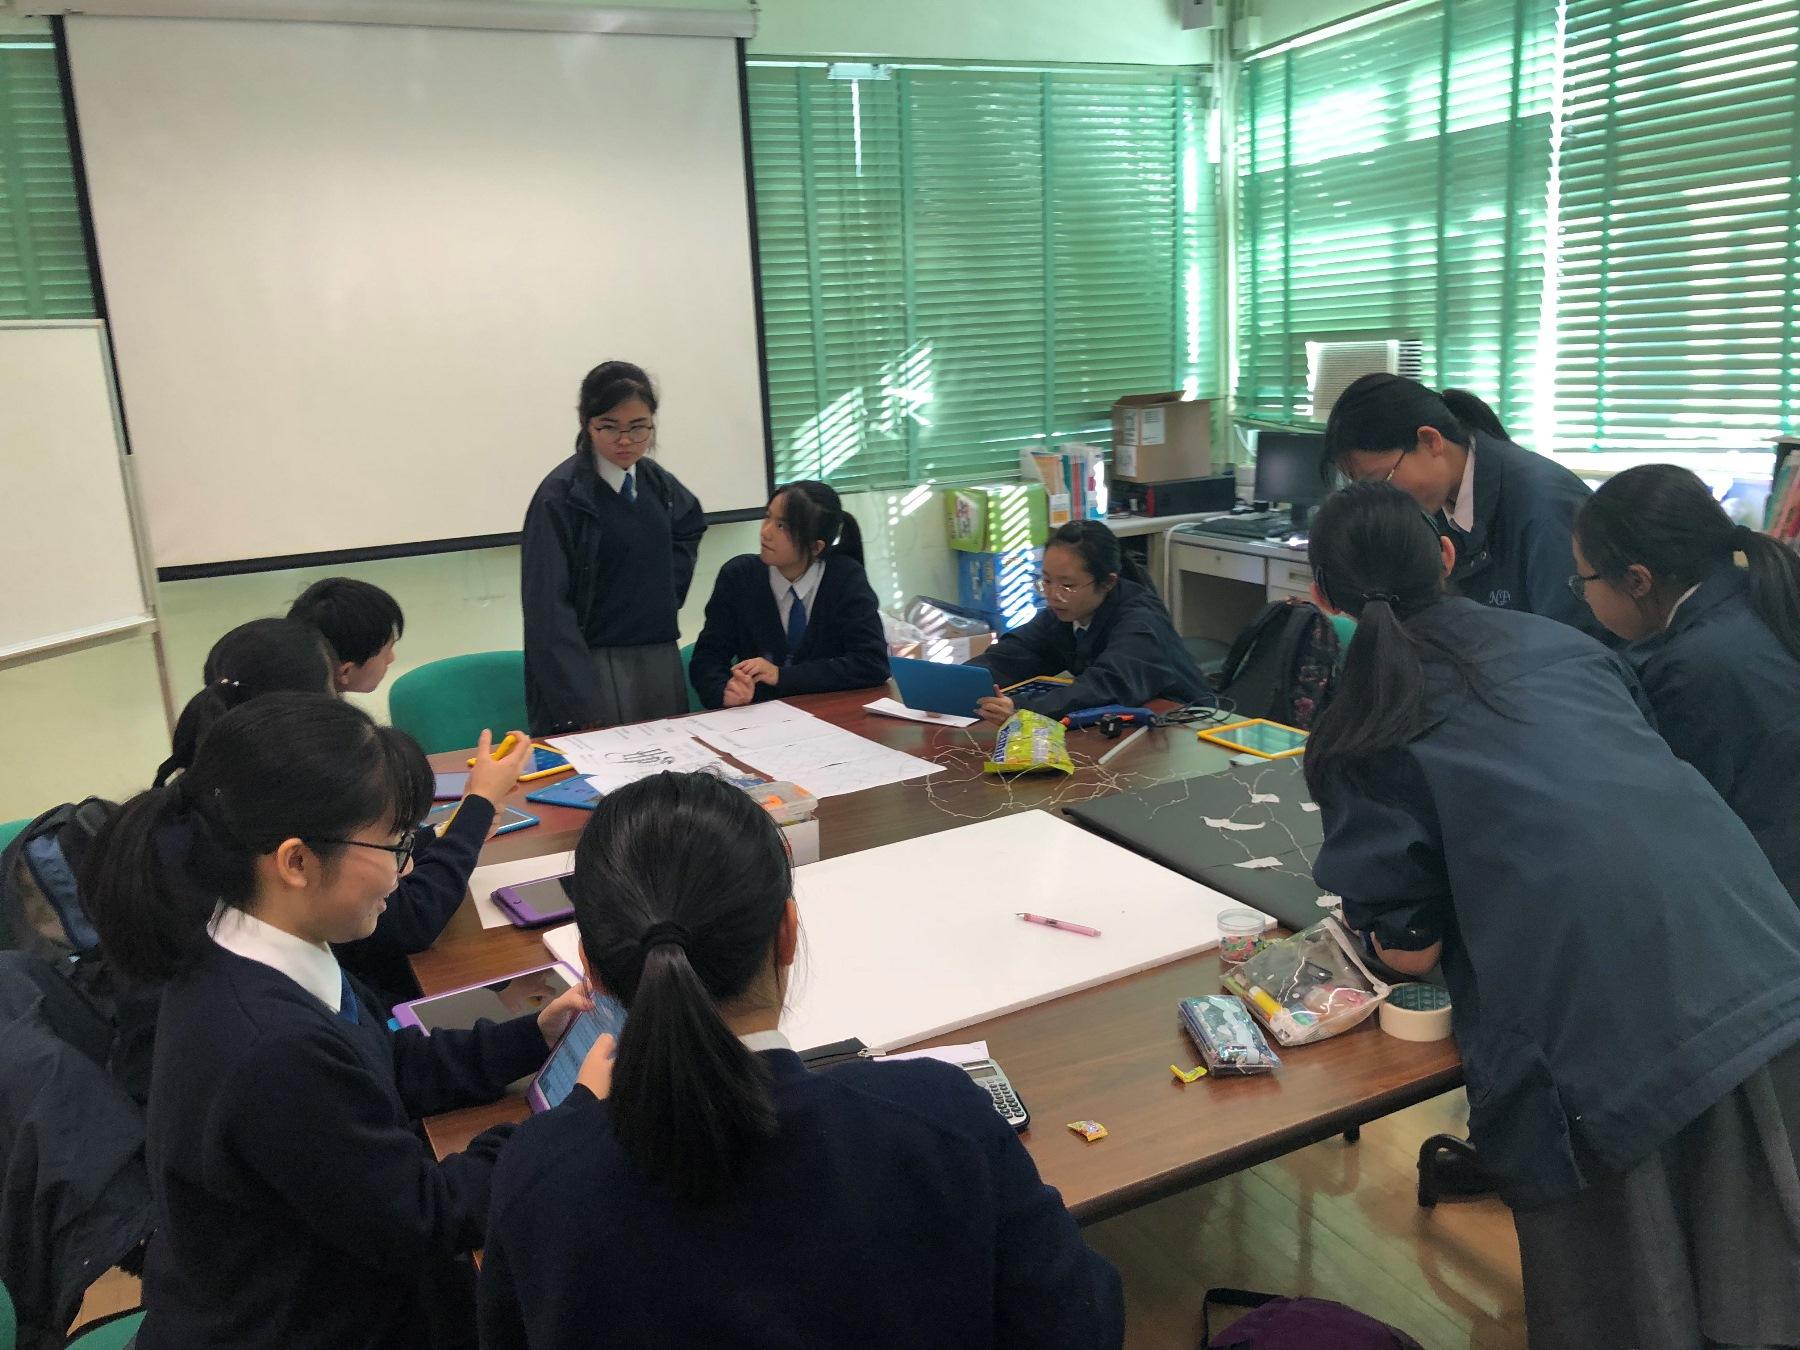 http://npc.edu.hk/sites/default/files/img_6054.jpg